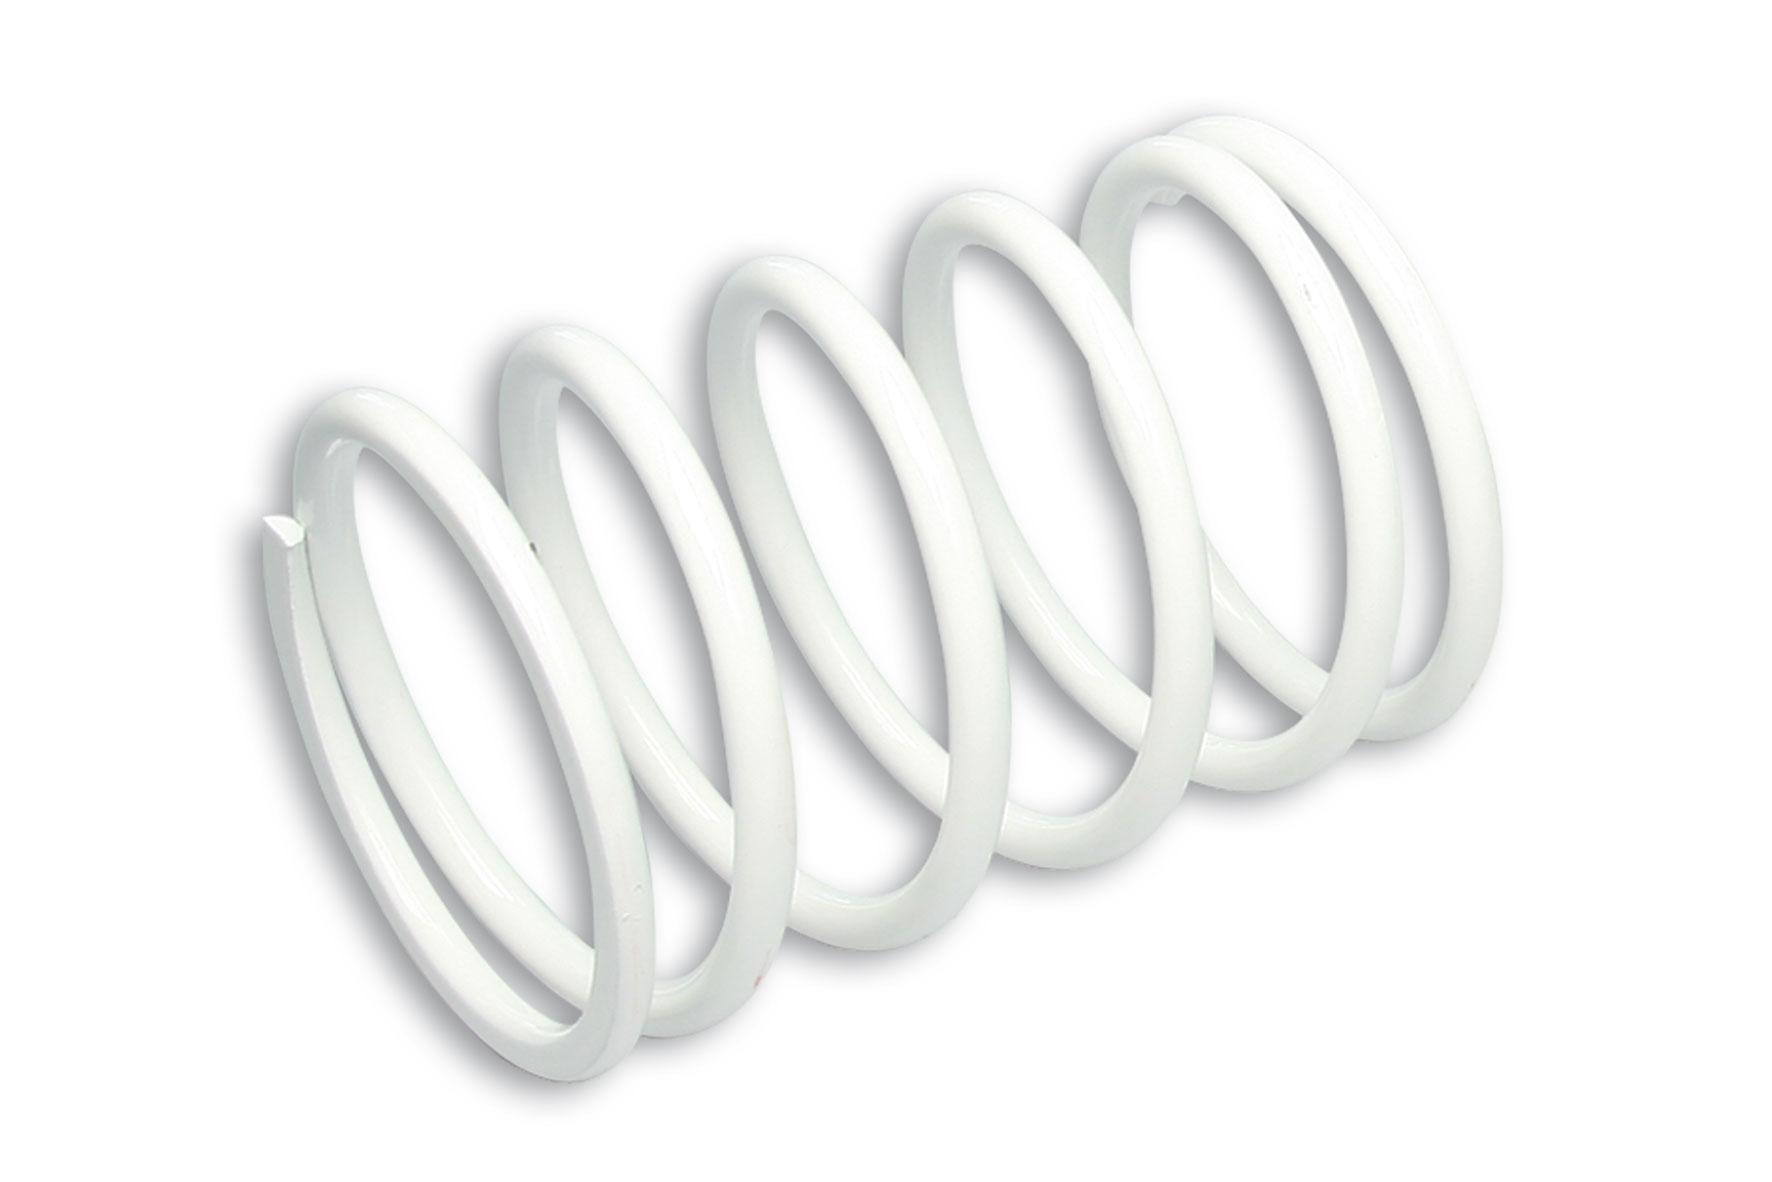 Molla di contrasto variatore bianca (Ø esterno 80,40x115 mm - Ø filo 6,5 mm - k 11,2)